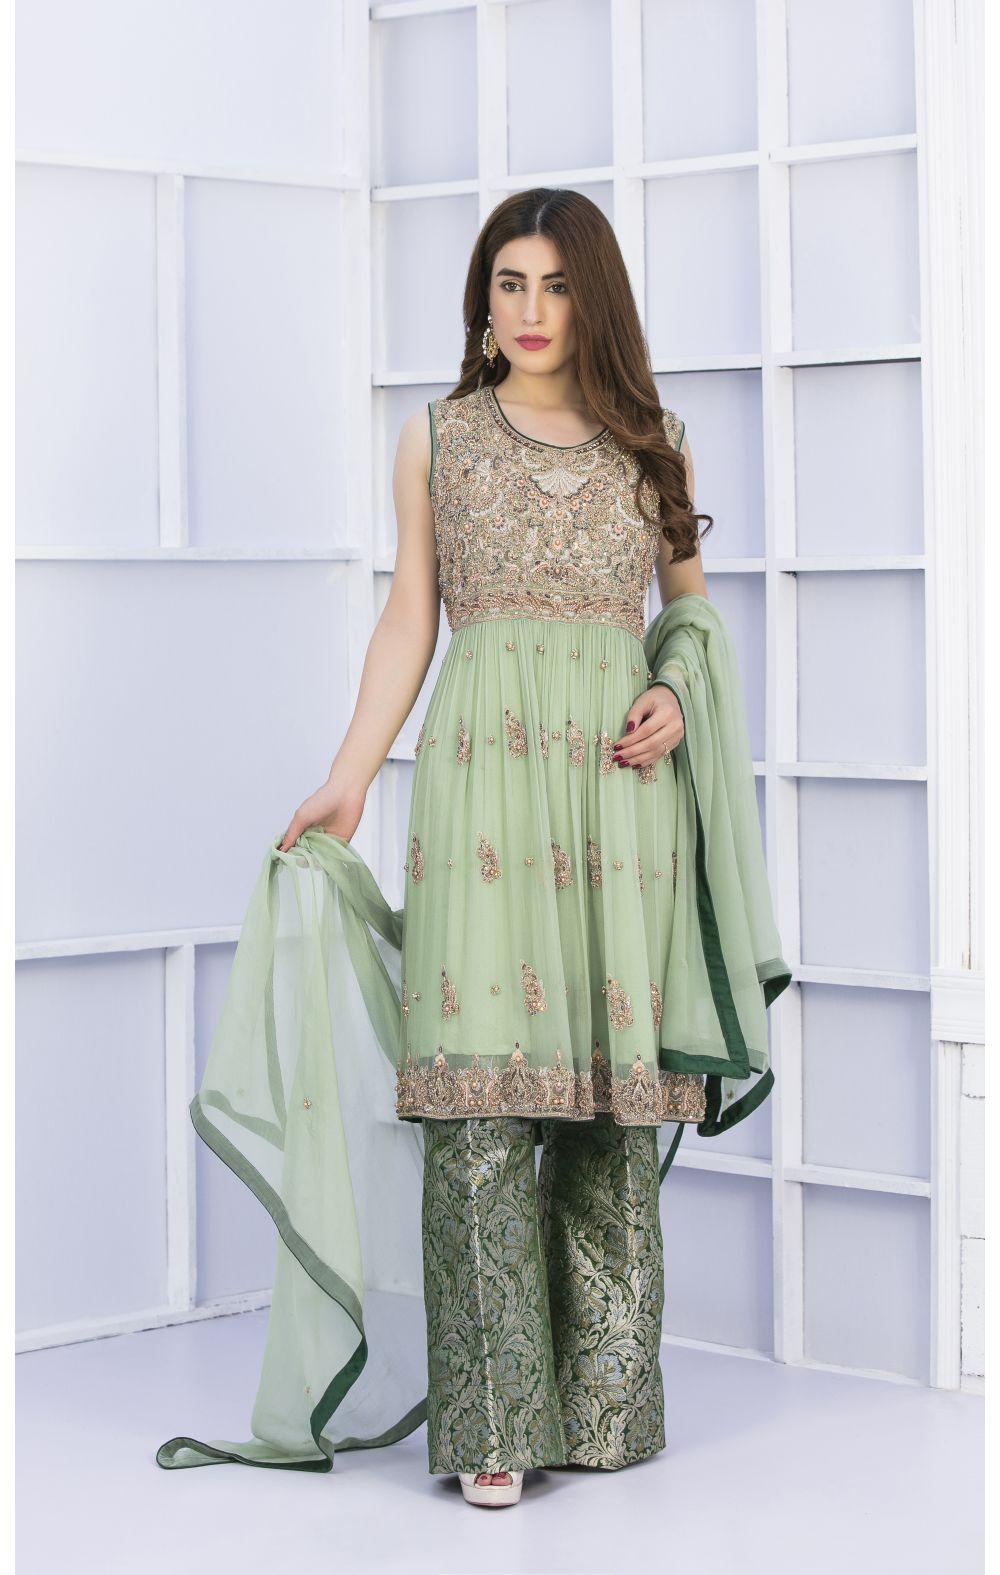 Buy Exclusive Pista Green And Bottle Green Bridal Wear – G15127 Online In USA, Uk & Pakistan